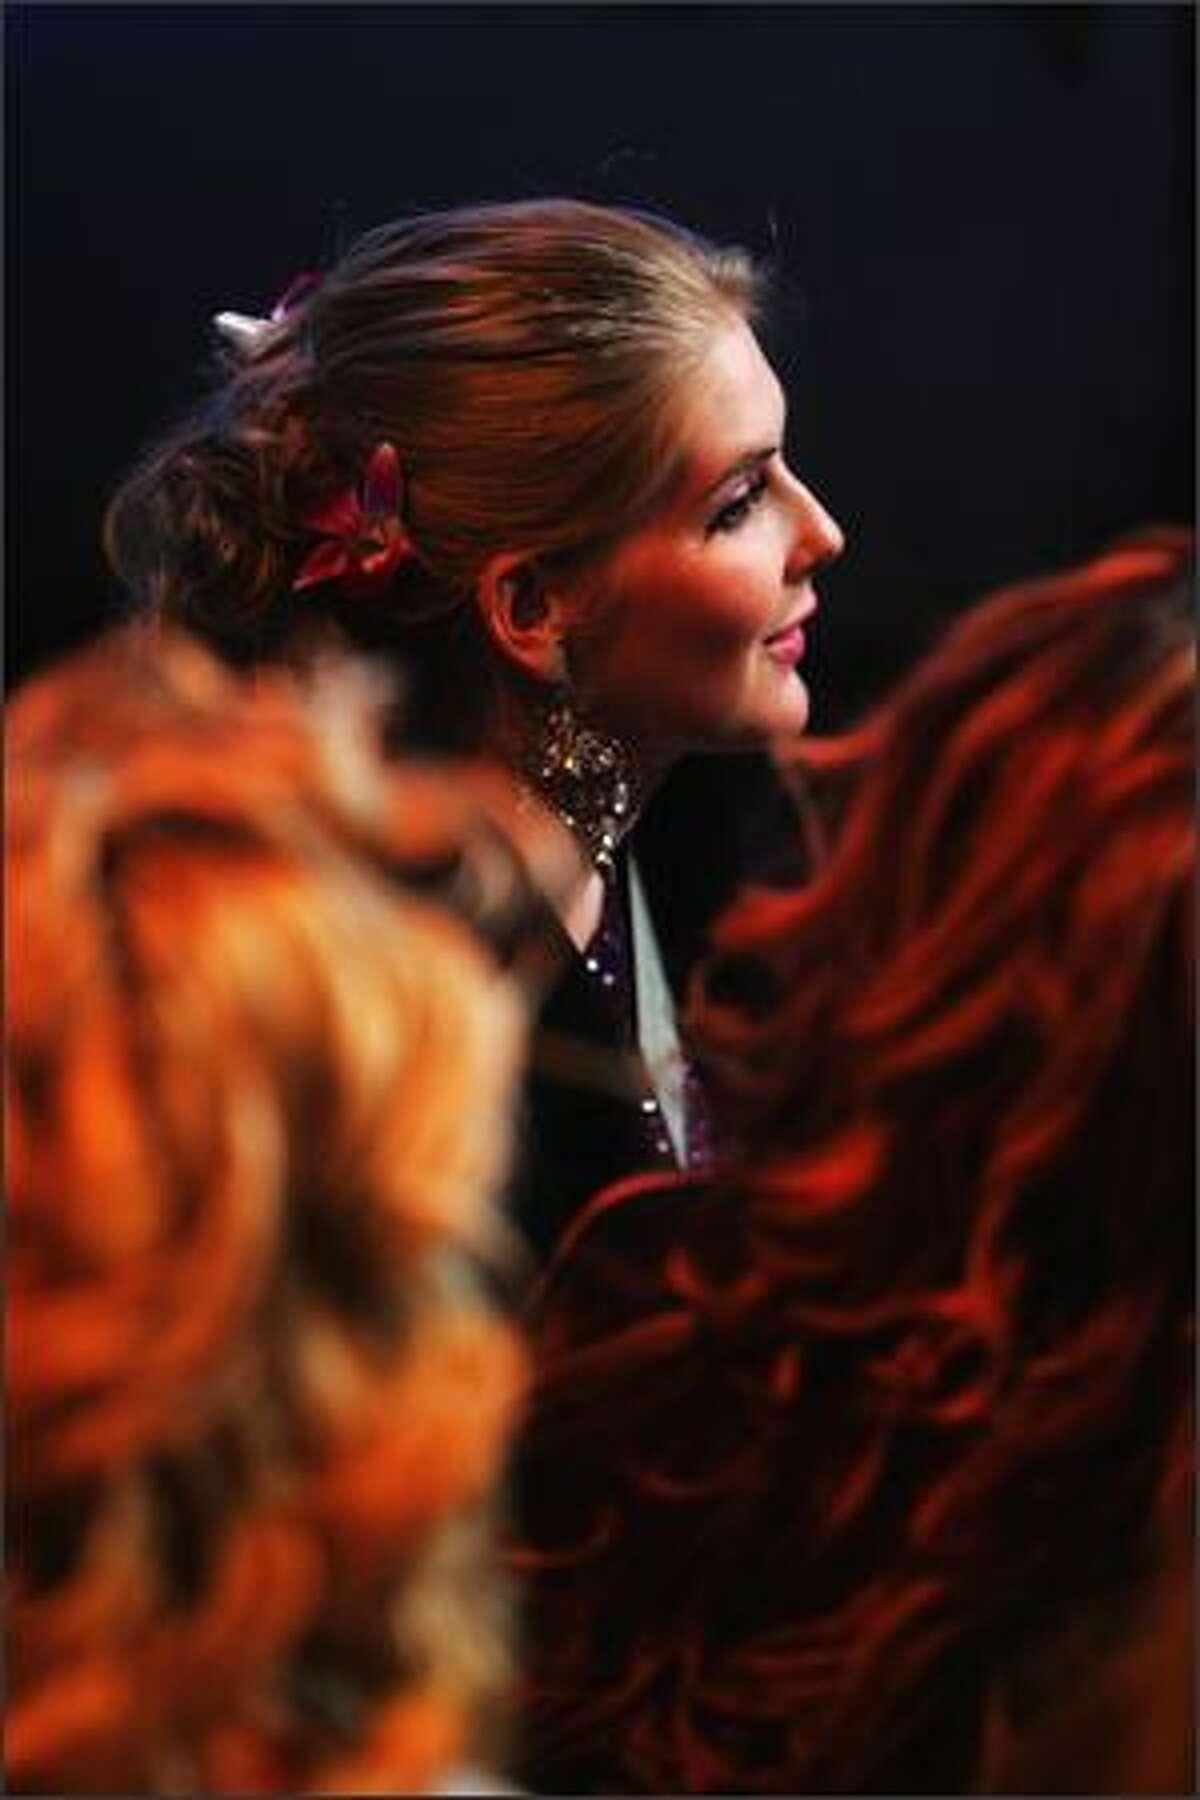 Caroline Pemberton, Miss Australia 2007, looks on in a TV studio.